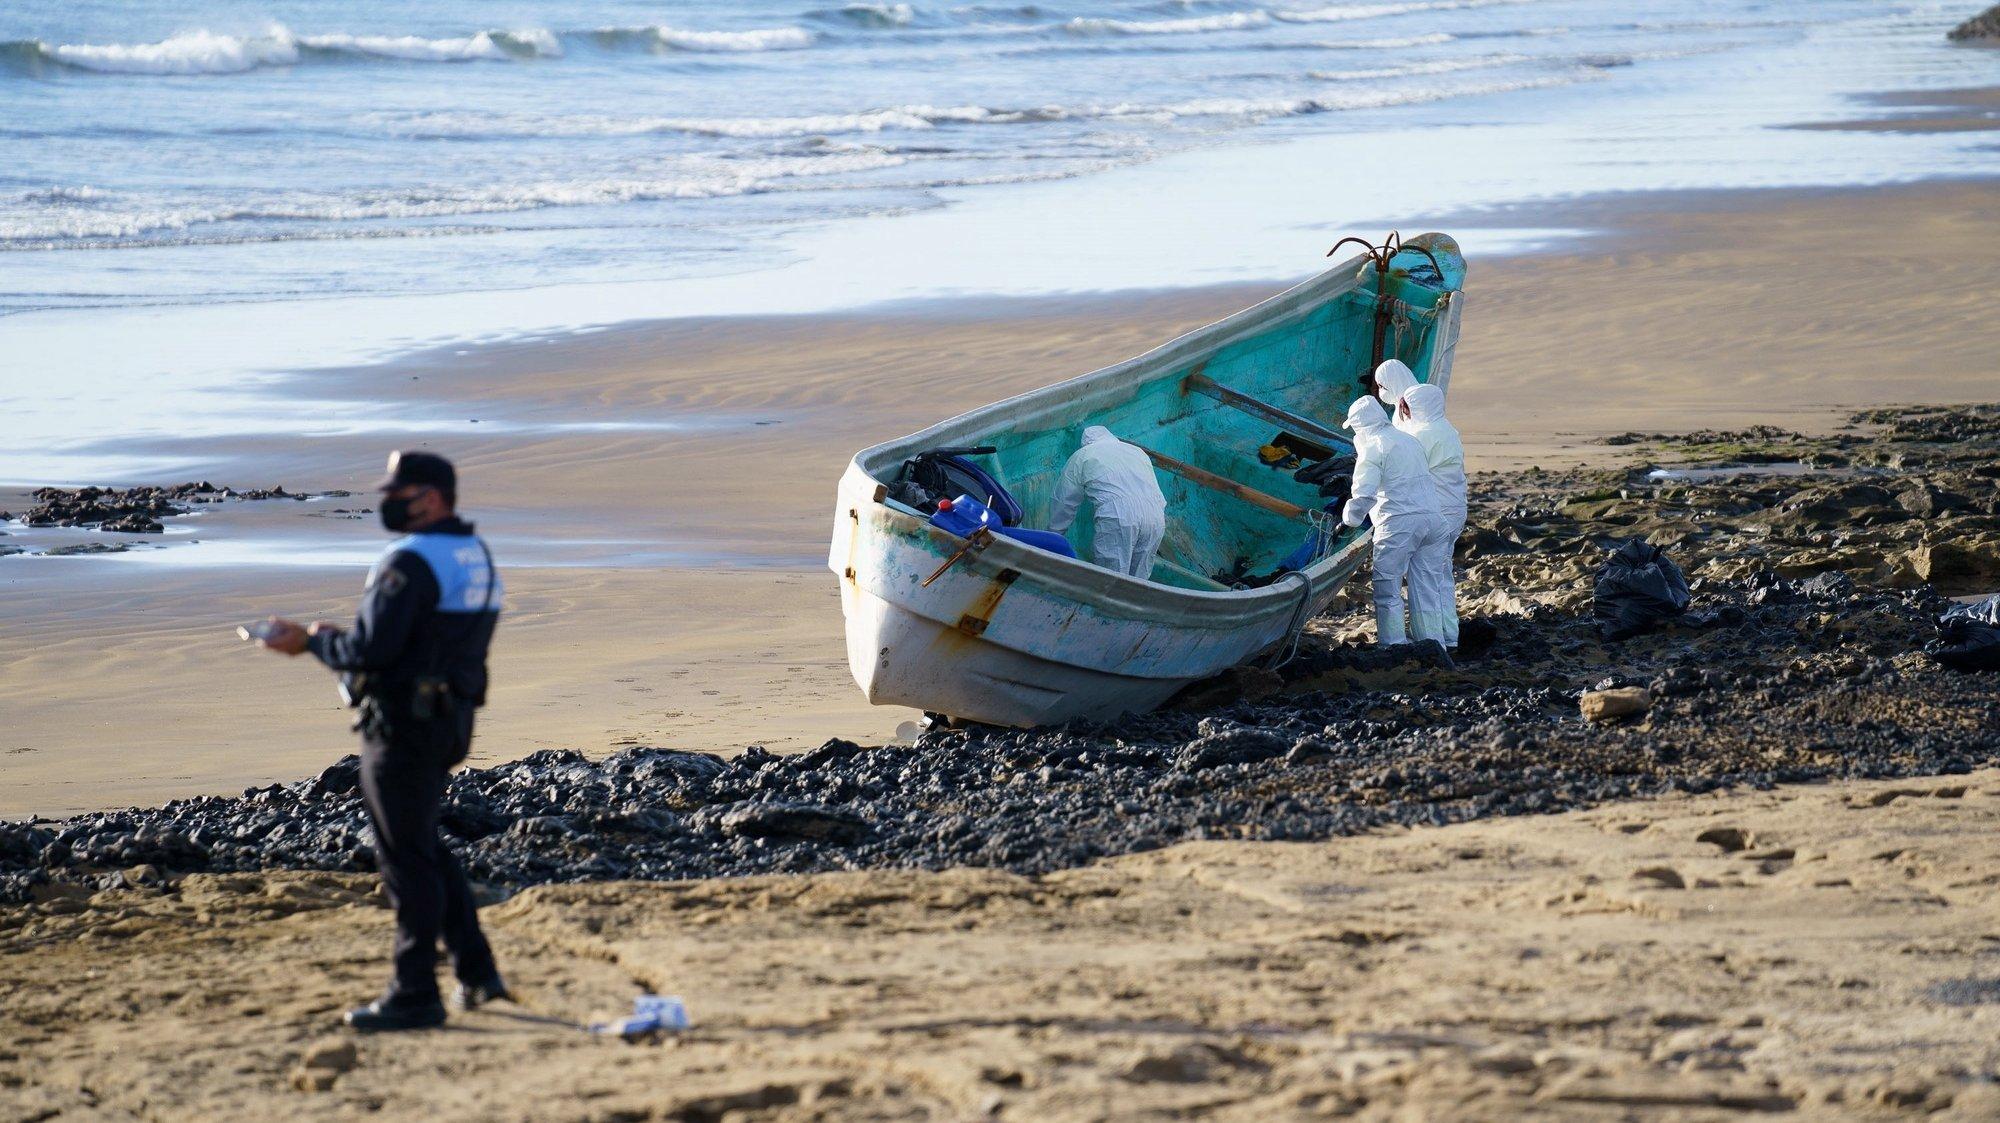 epa08920034 View of the dugout canoe in which four migrants died as a total of 47 people on board reached Granadilla de Abona beach in Canary Islands, Spain, early 05 January 2021.  EPA/Ramon de la Rocha